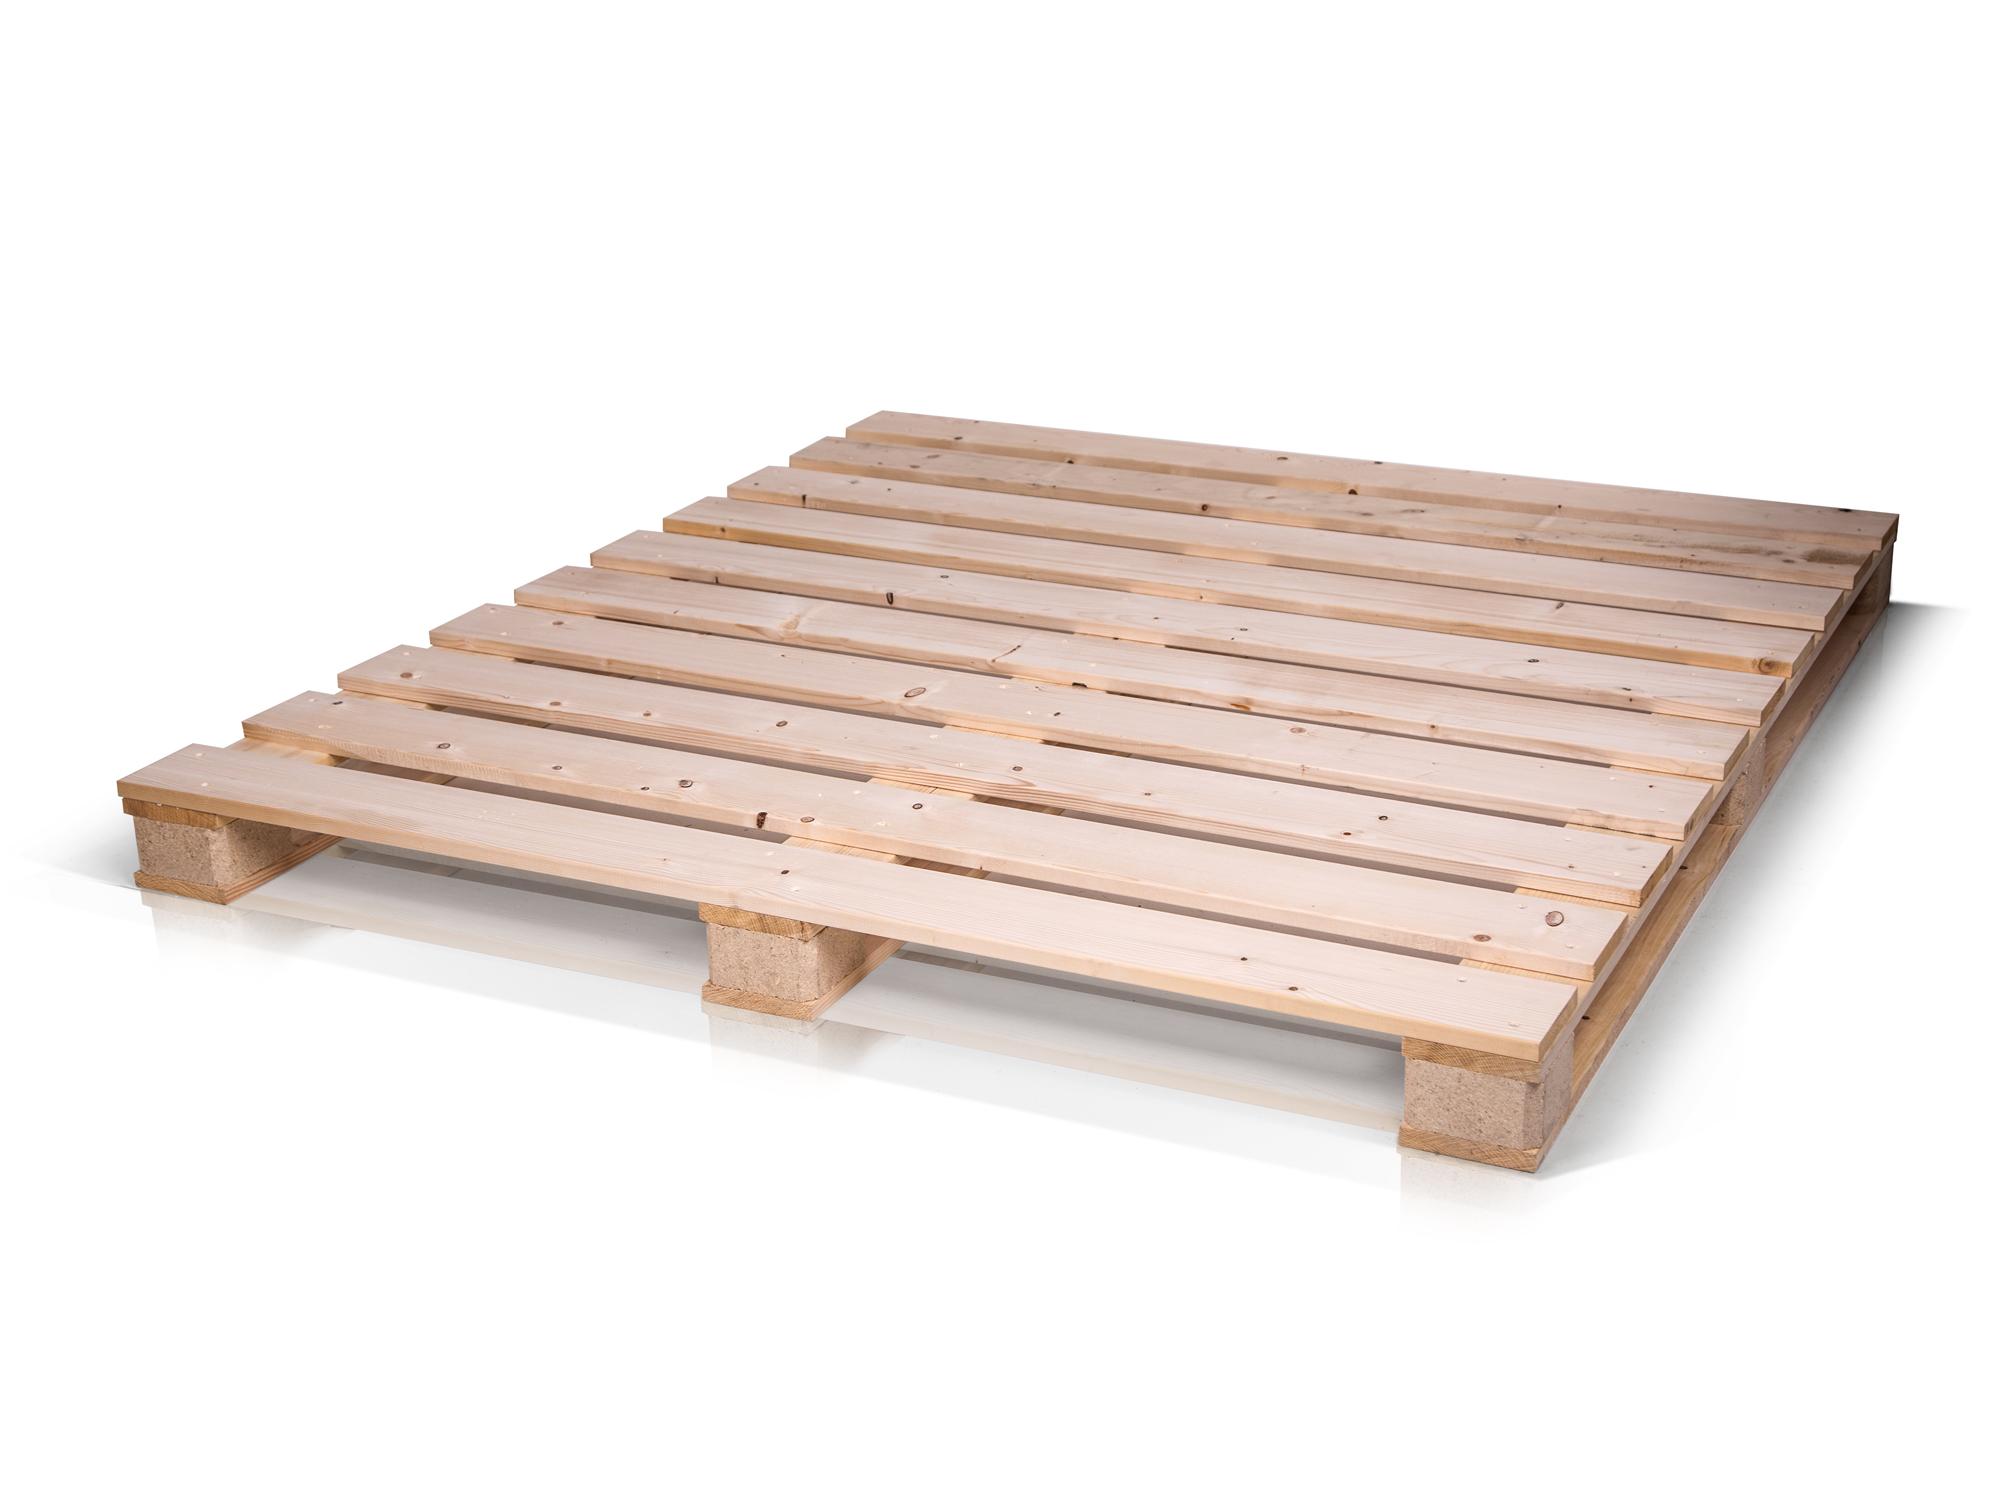 paletti massivholzbett aus paletten 180 x 200 cm fichte natur. Black Bedroom Furniture Sets. Home Design Ideas